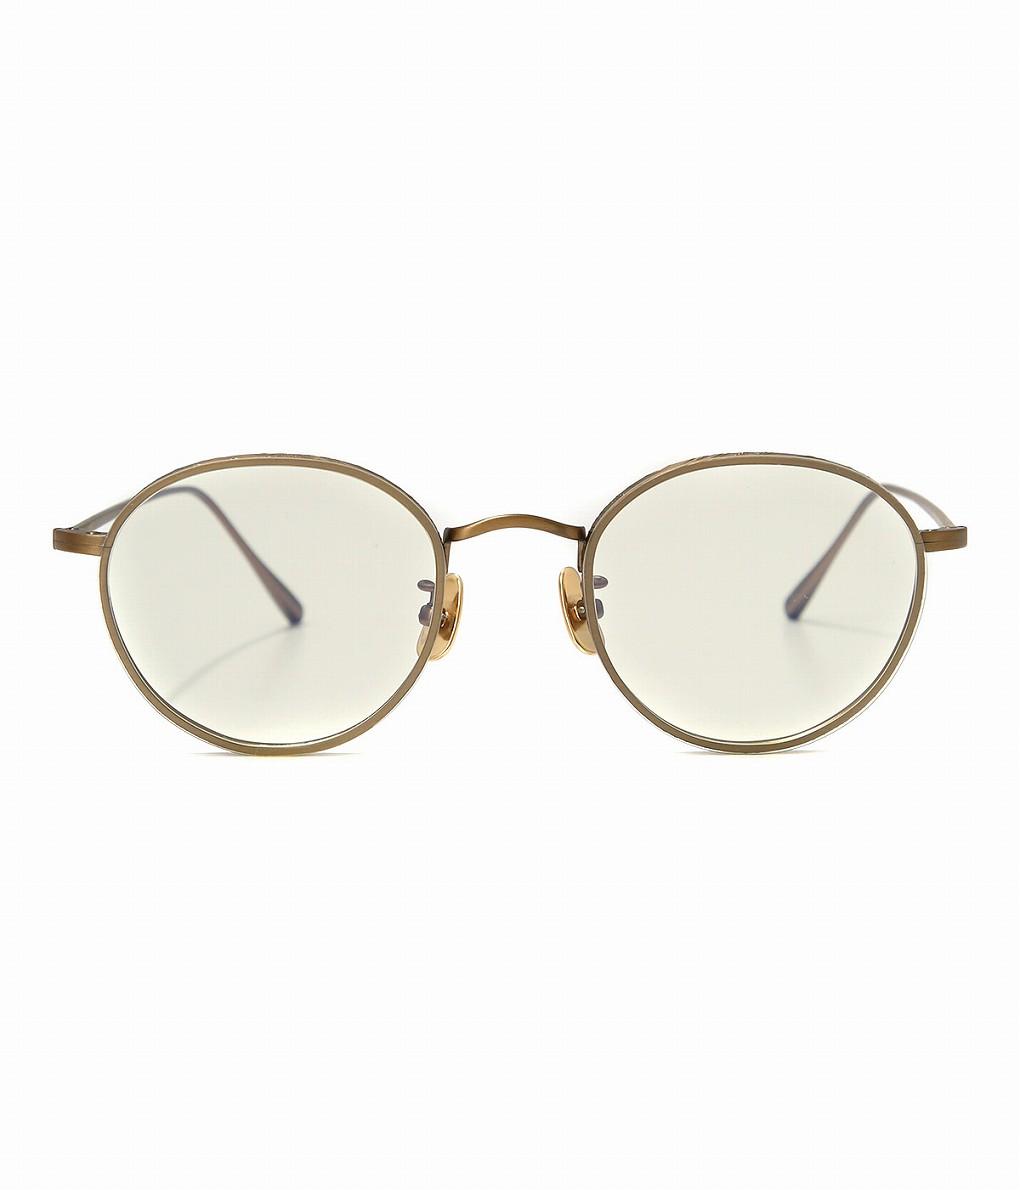 A.D.S.R. / エーディーエスアール : BUKEM01 -Antique Gold- : ADSR ゴールド クリア サングラス メンズ : BUKEM01-c【WAX】